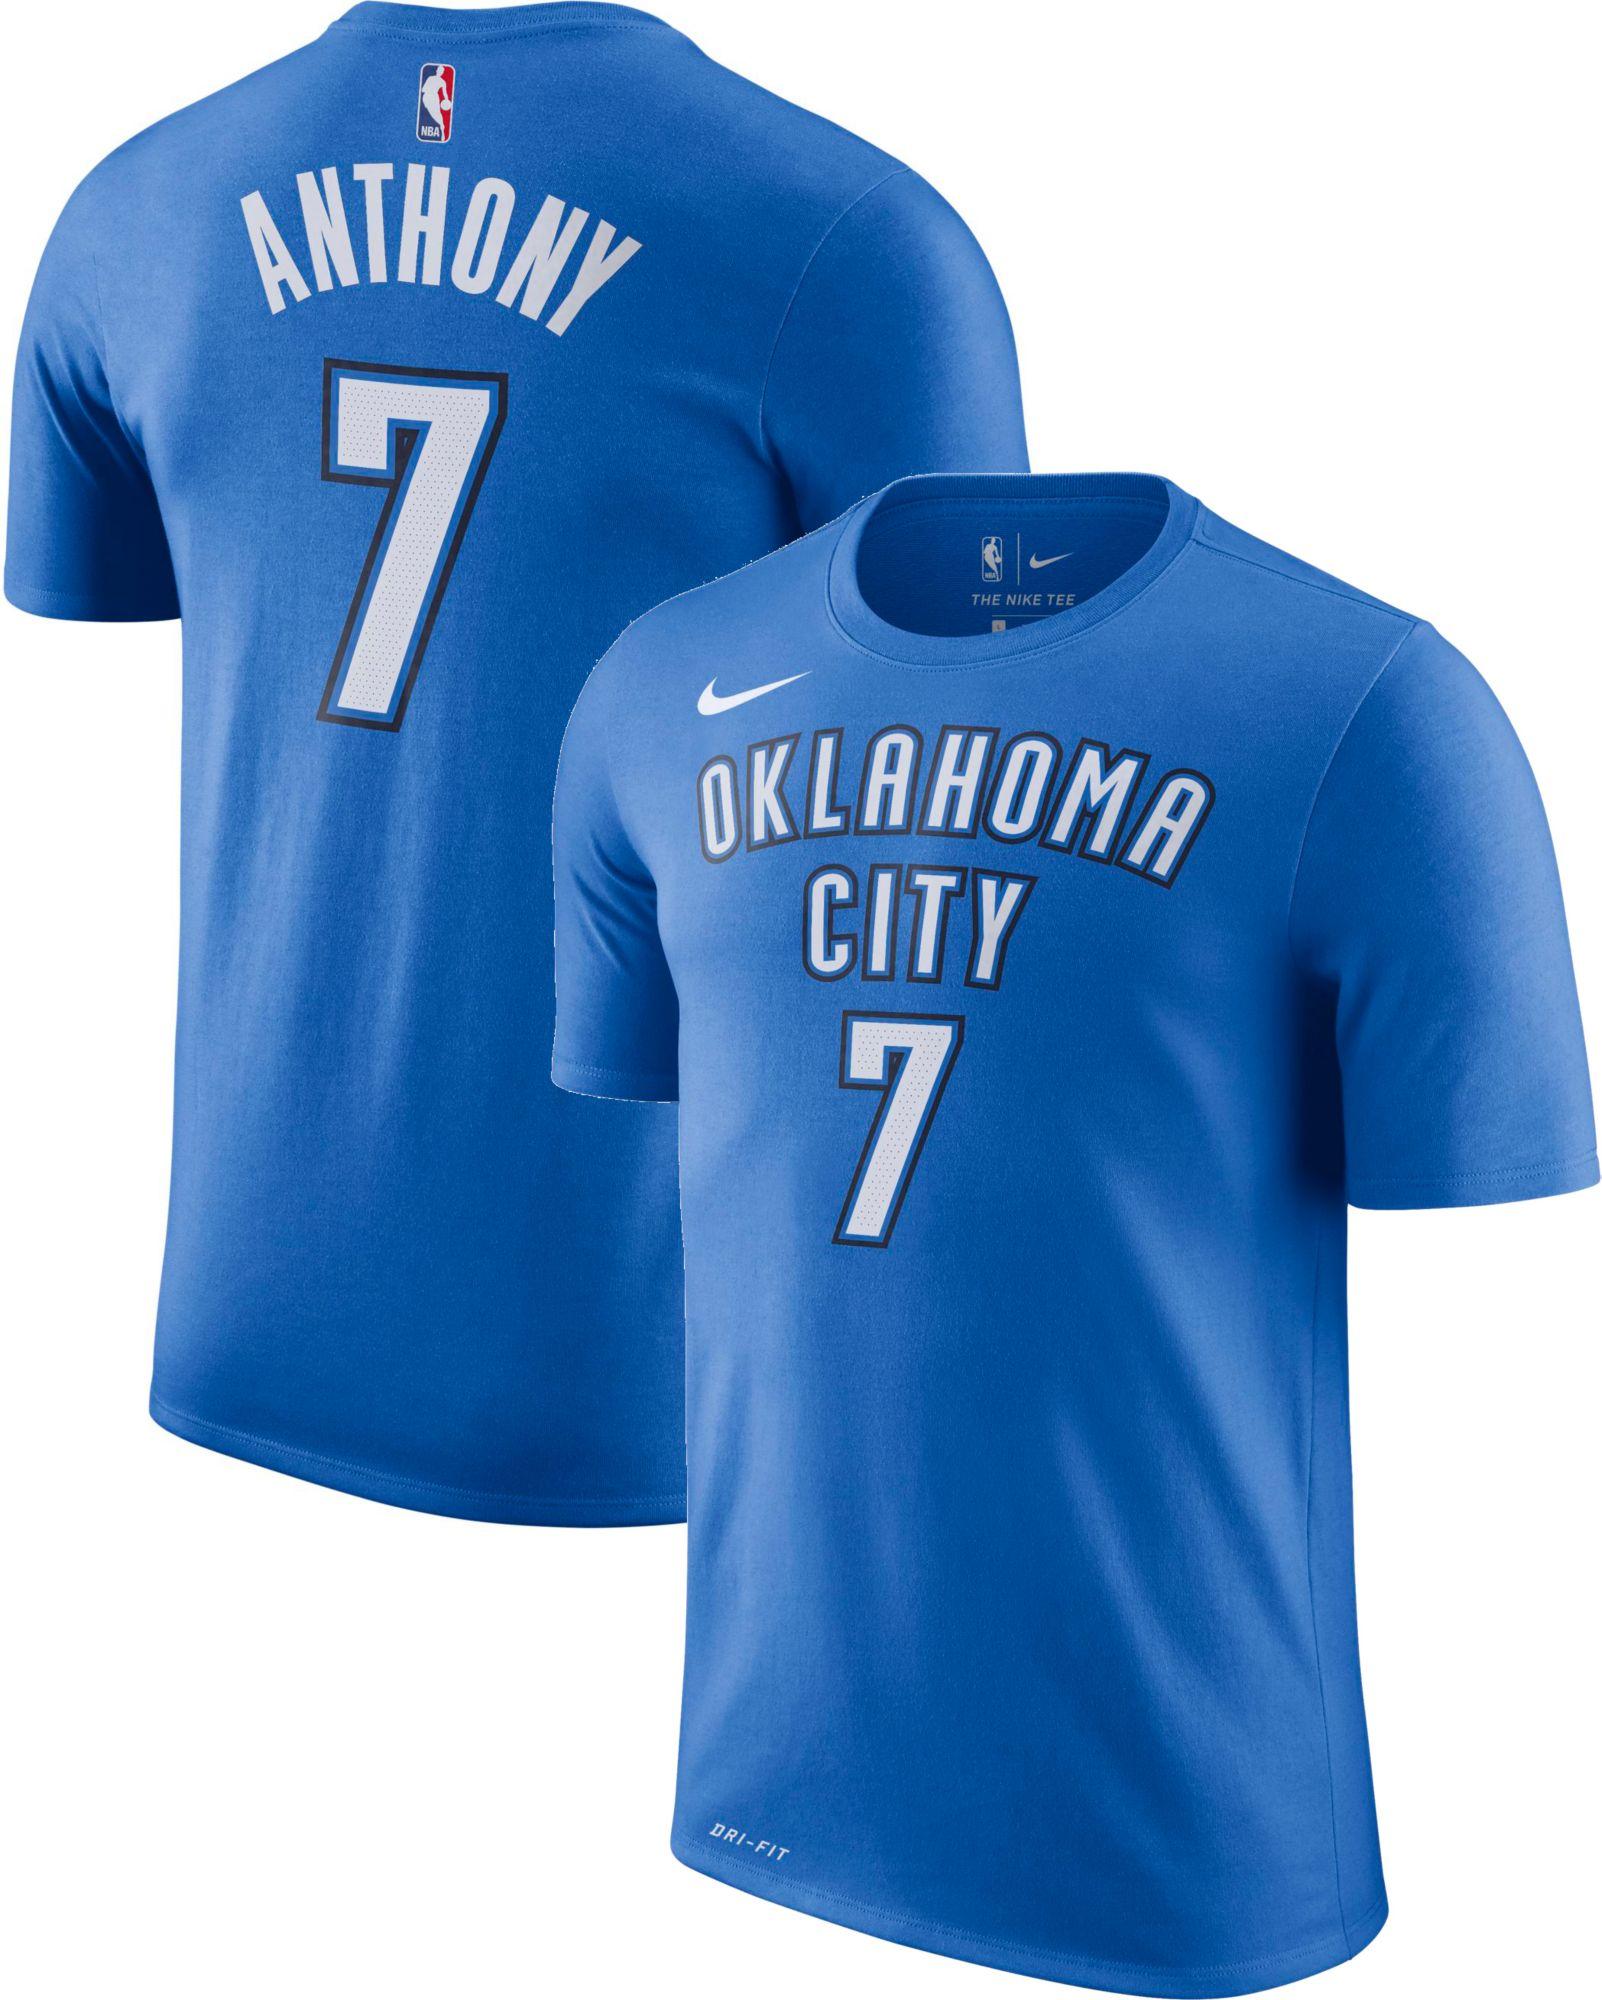 Nike Men's Oklahoma City Thunder Carmelo Anthony #7 Dri-FIT Blue T-Shirt |  DICK'S Sporting Goods